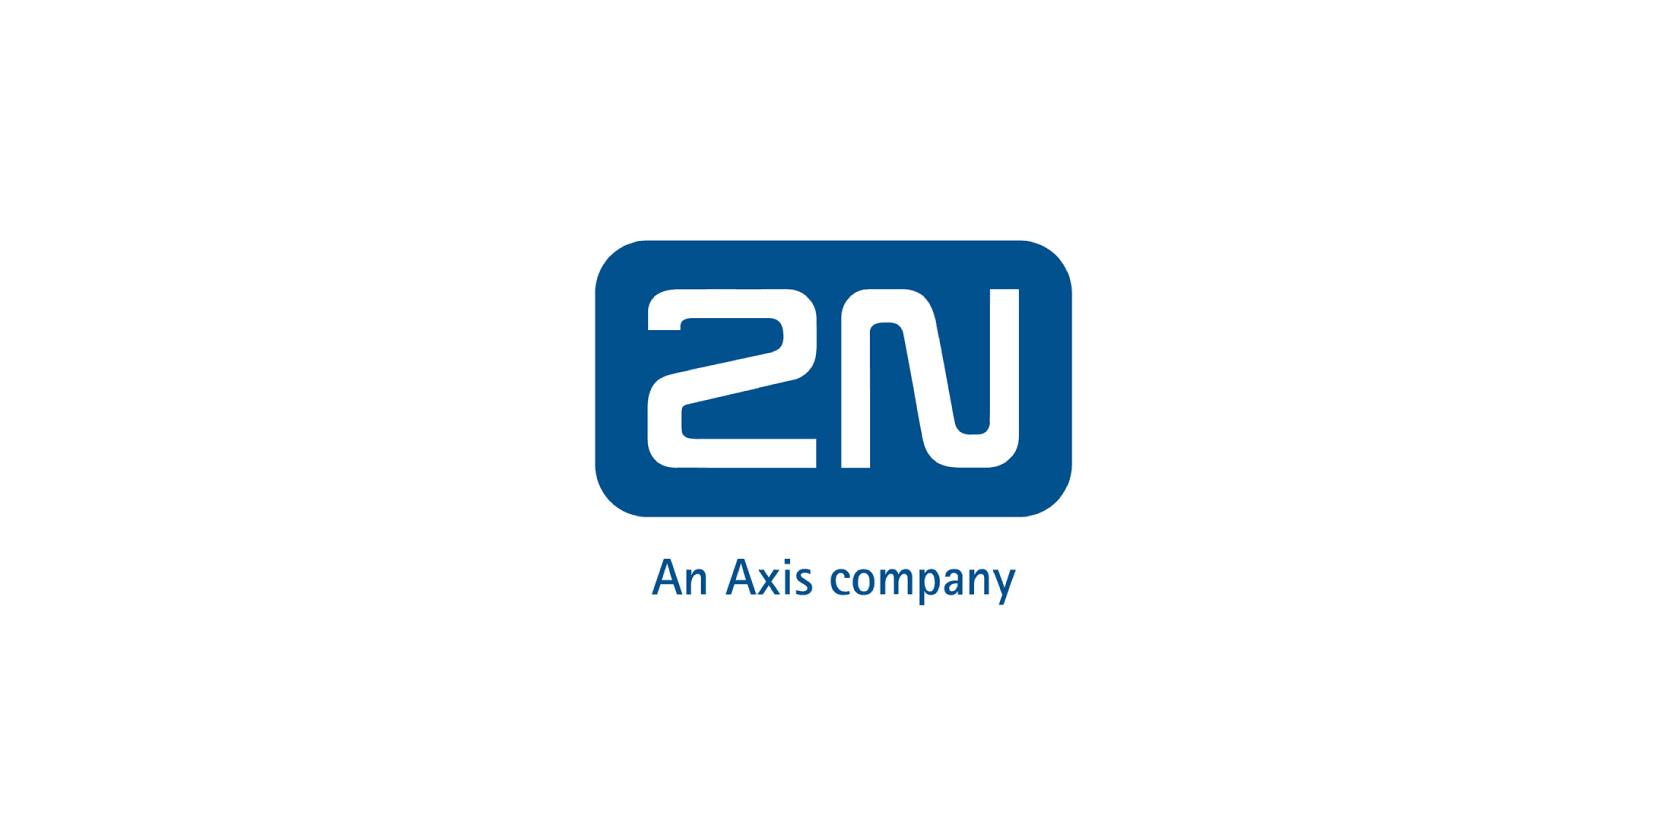 2N company logo